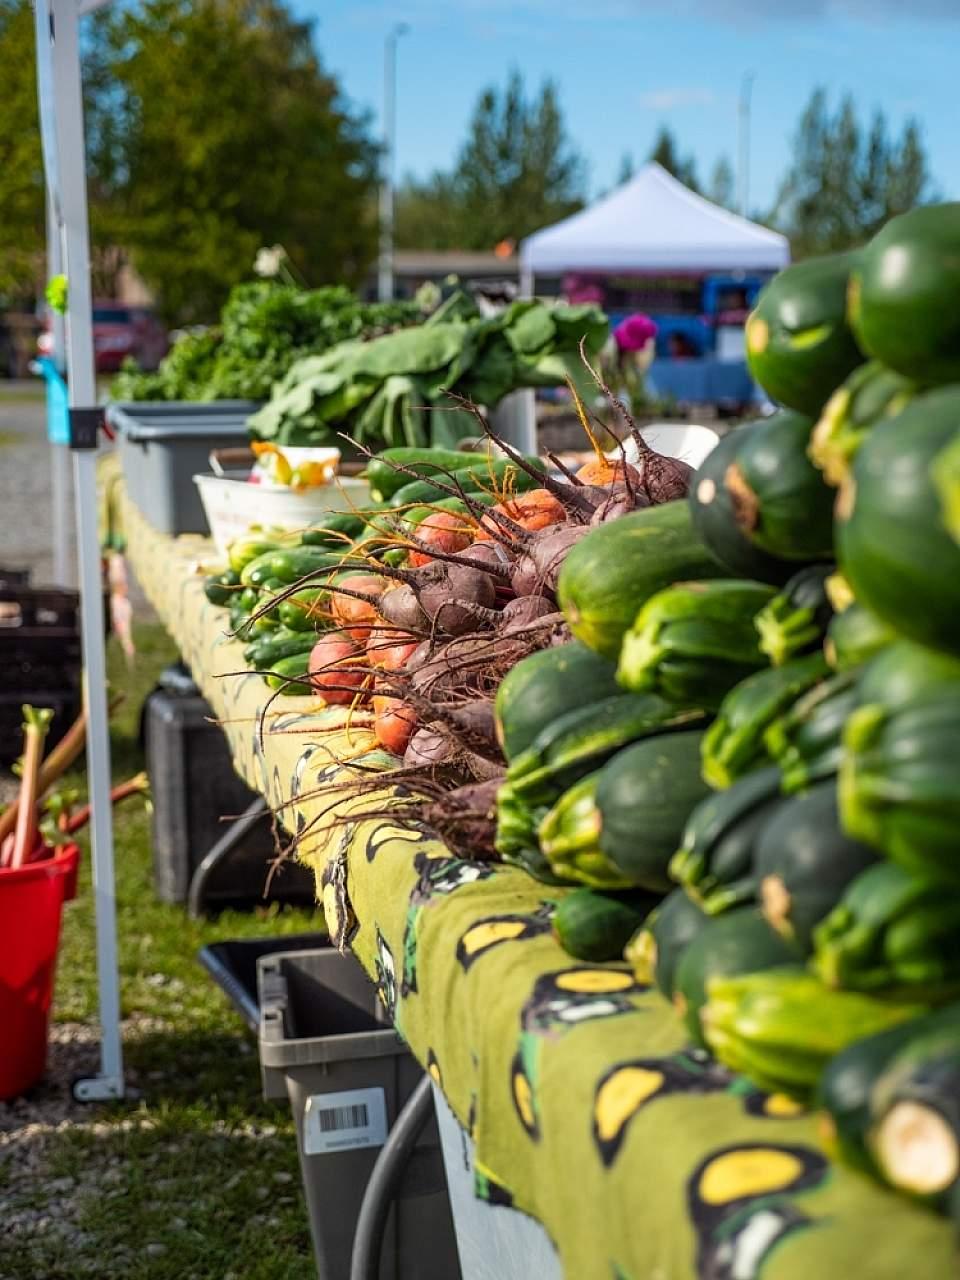 Fresh veggies lined up at Soldotna's Wednesday Market